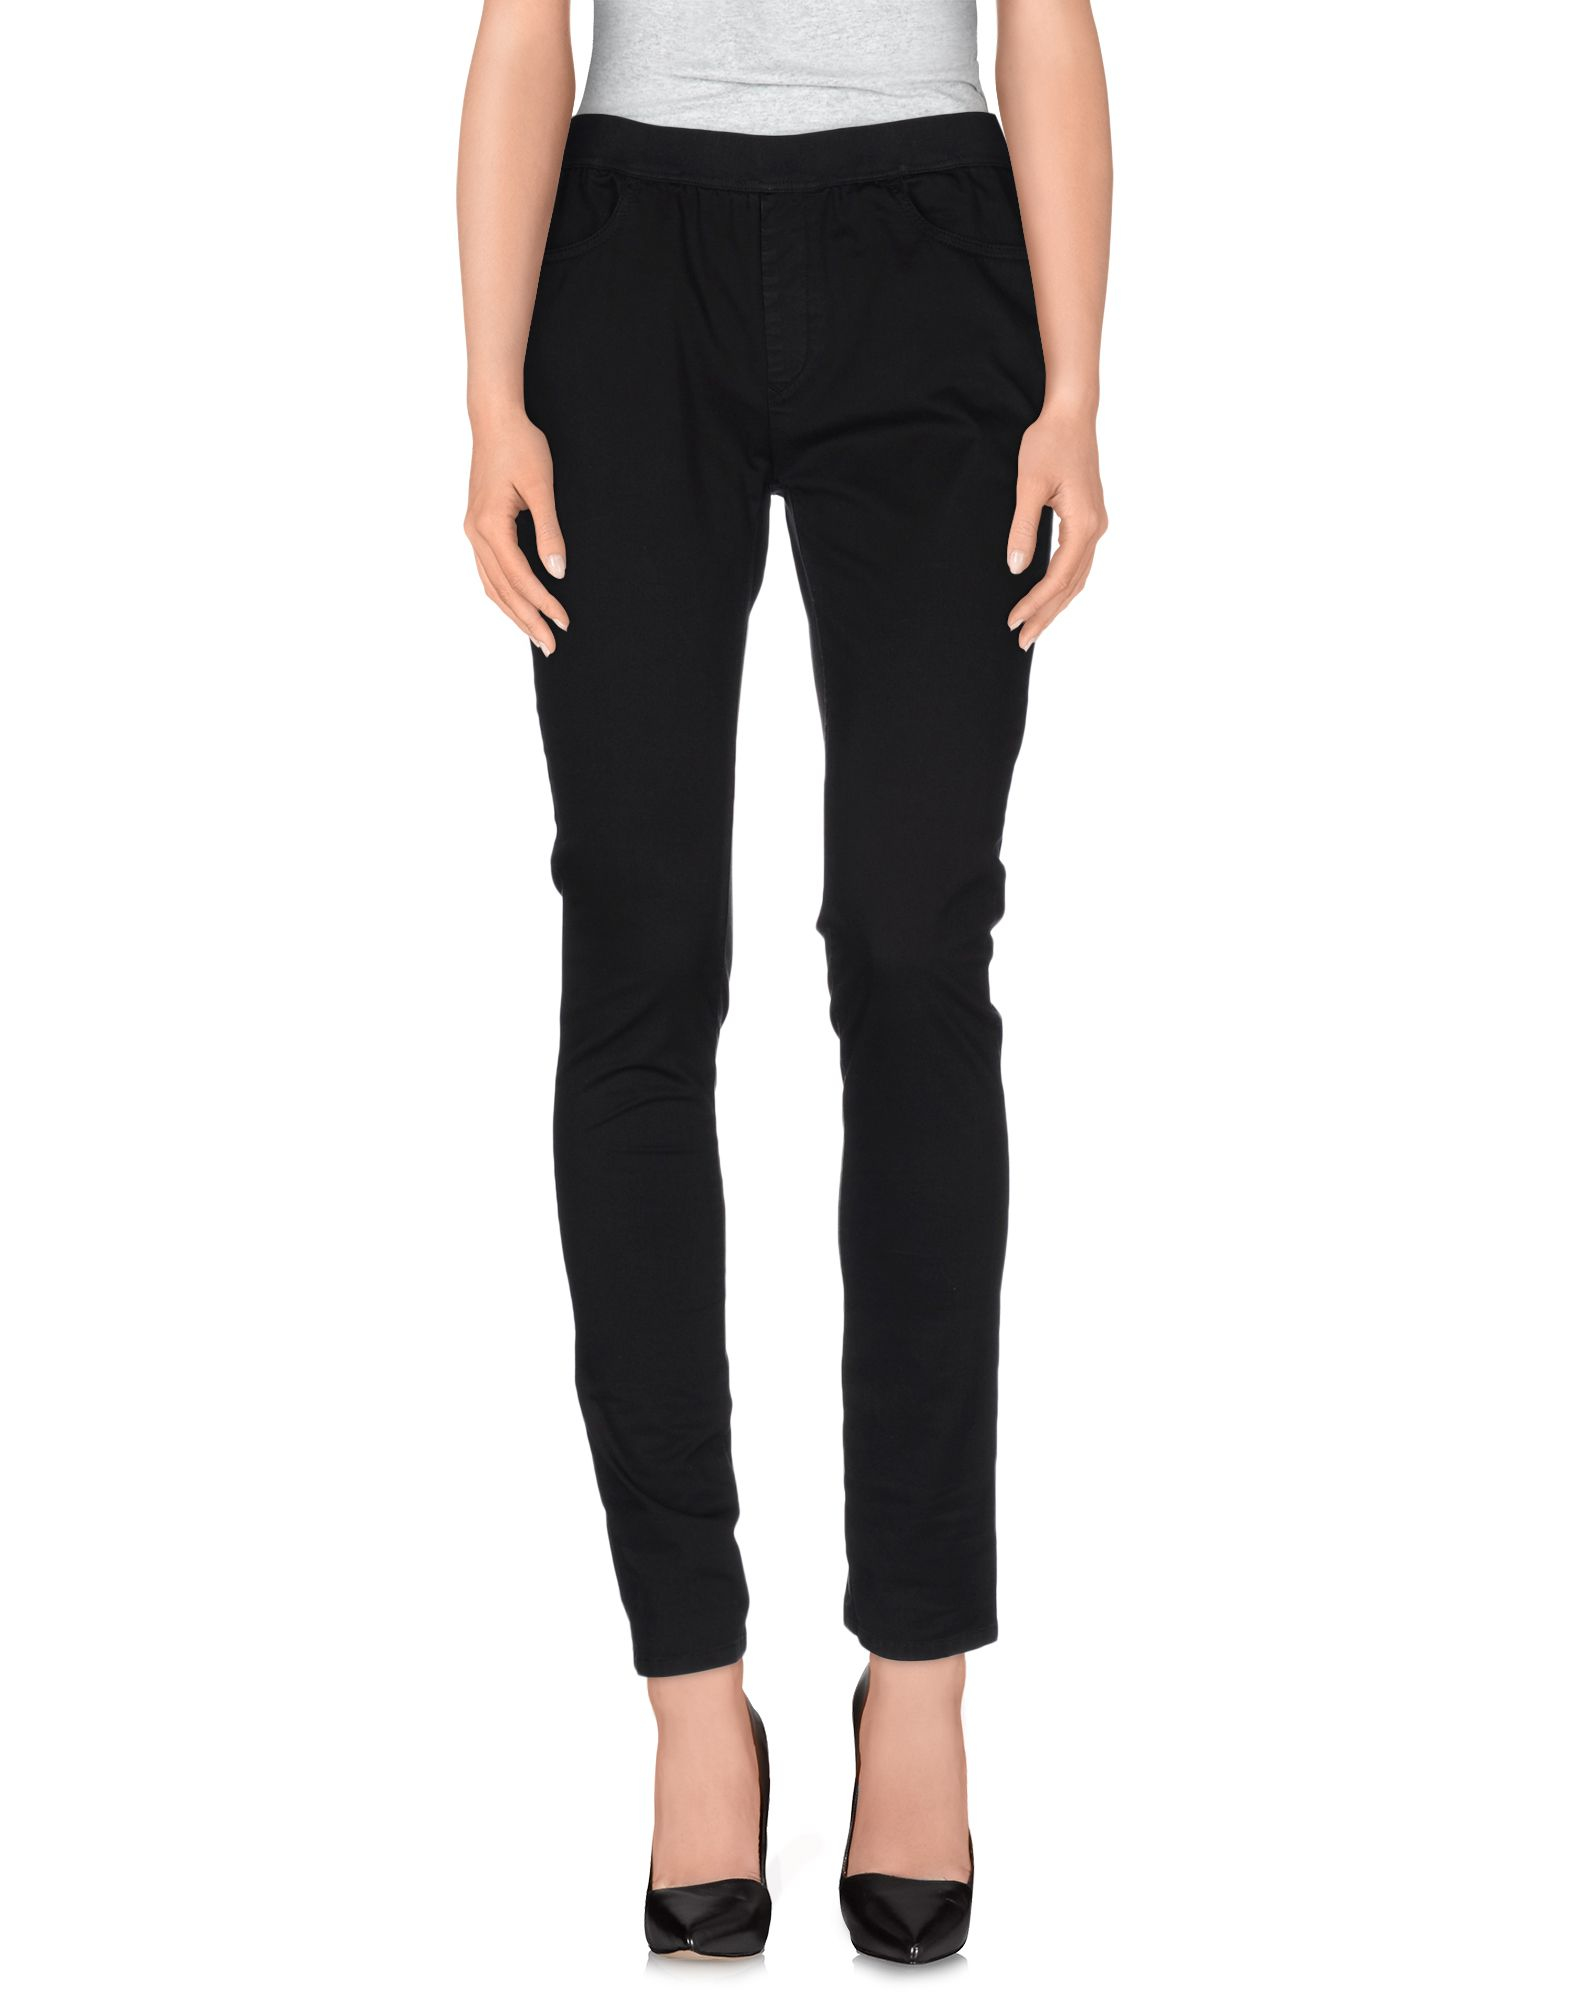 Mm6 by maison martin margiela casual trouser in black lyst for 10 moulmein rise la maison